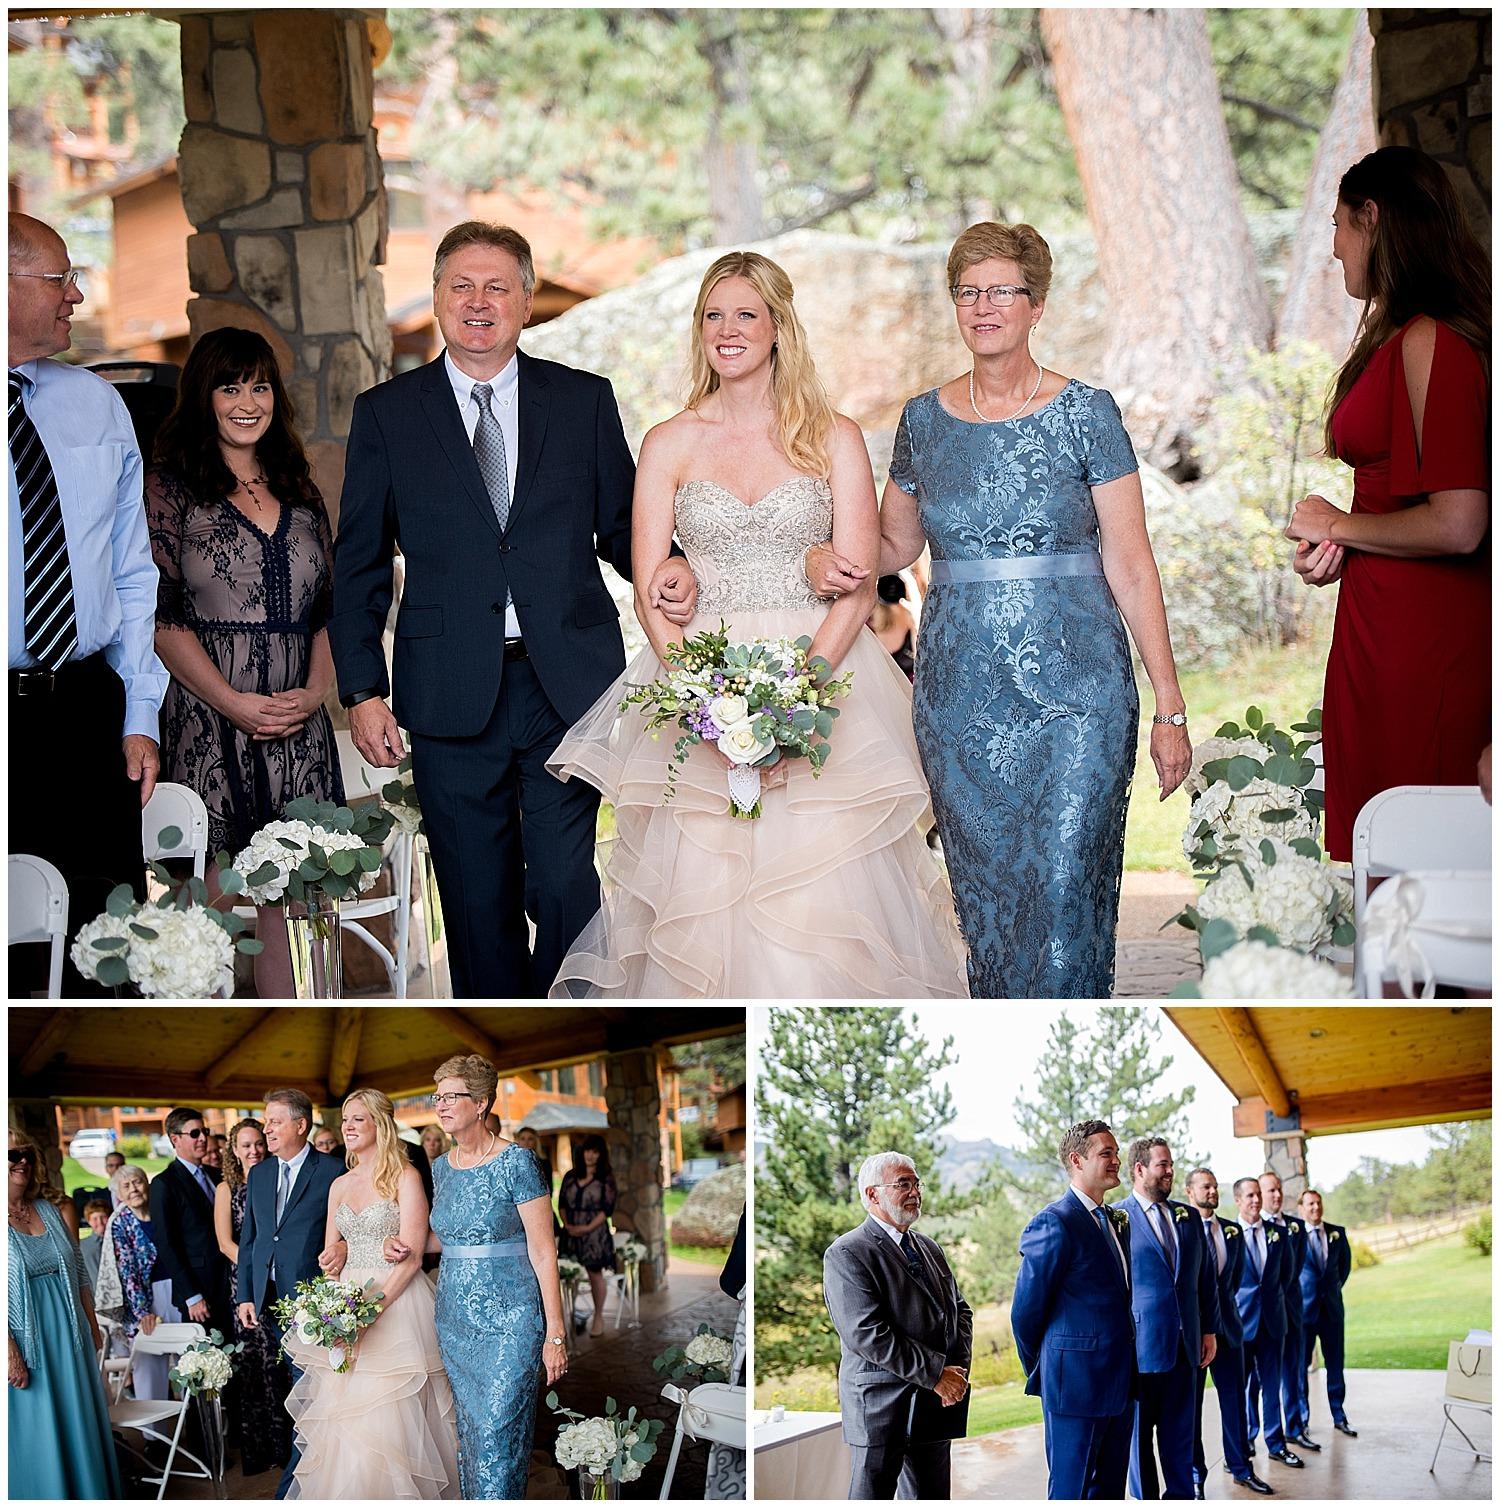 Estes-Park-Black-Canyon-Inn-Wedding-photography-_0041.jpg